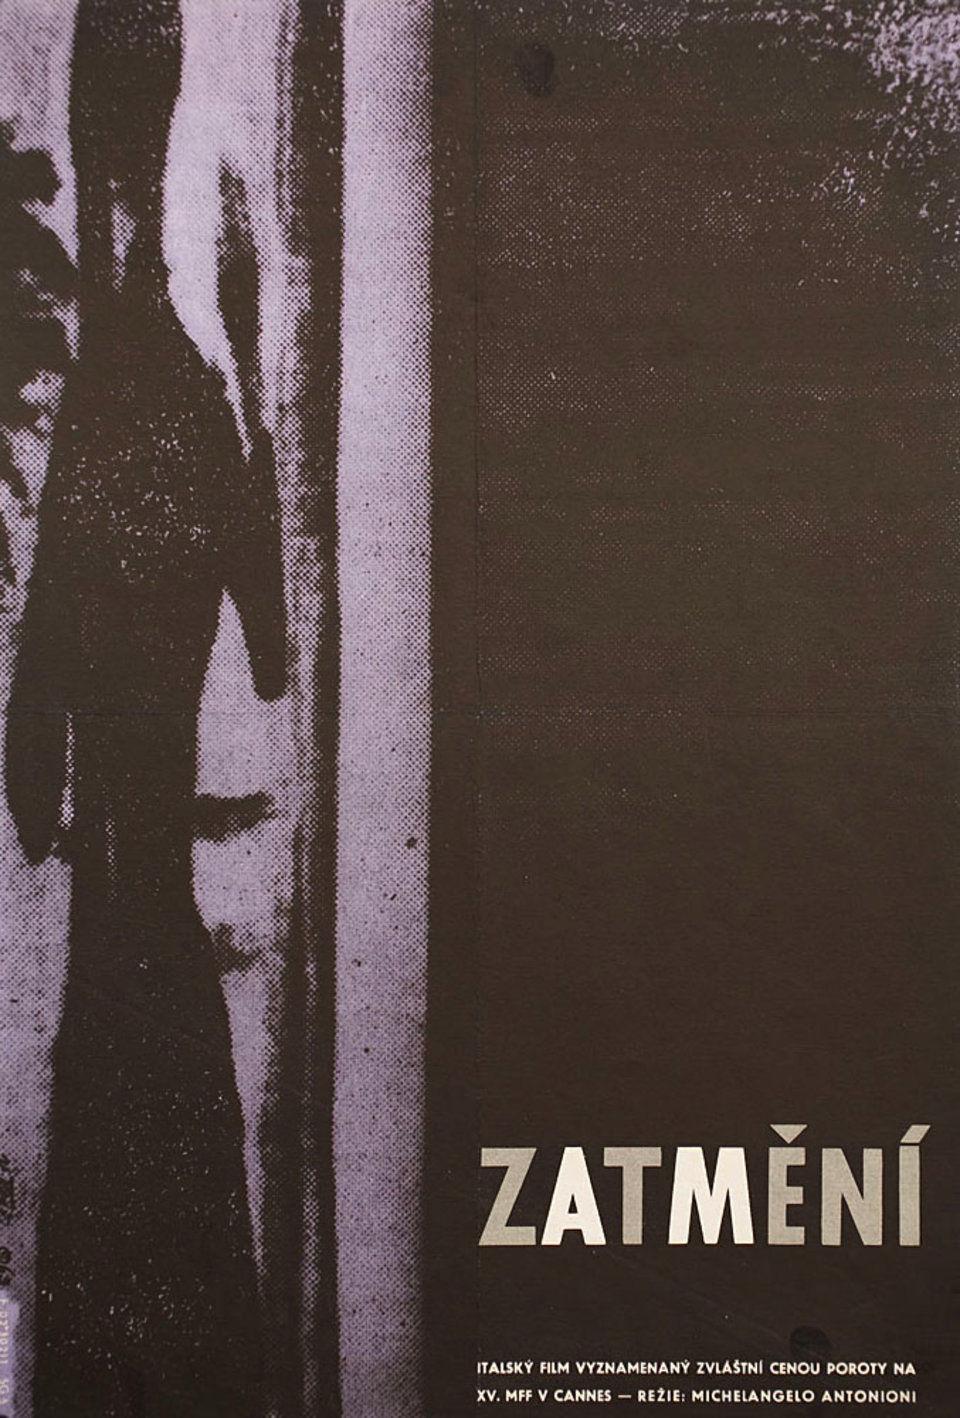 leclisse-1963-original-czech-republic-a3-movie-poster